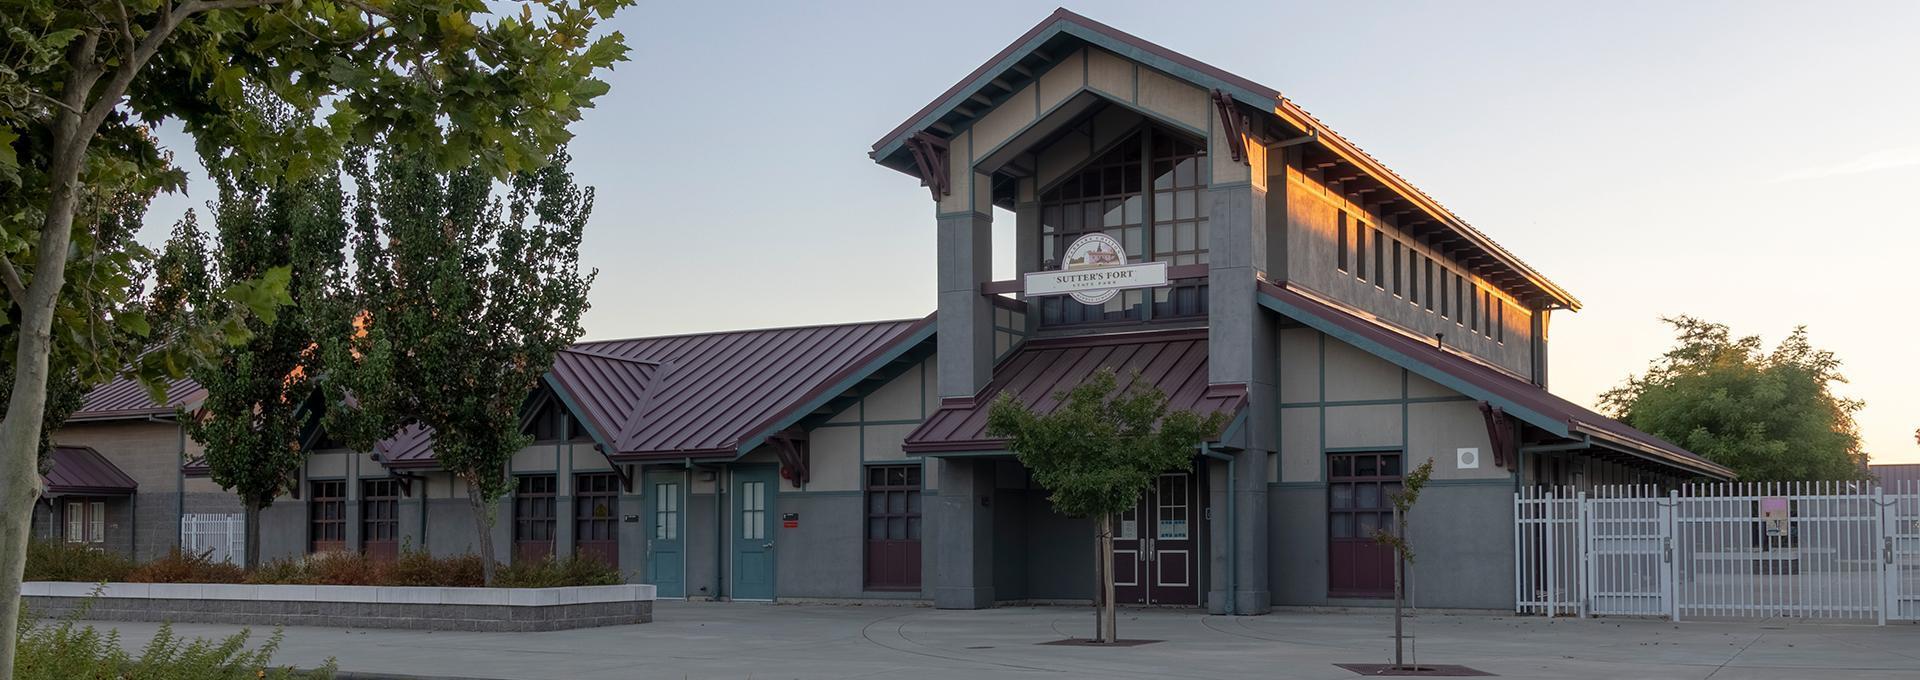 Roseville School District Calendar 2021-22 Pictures